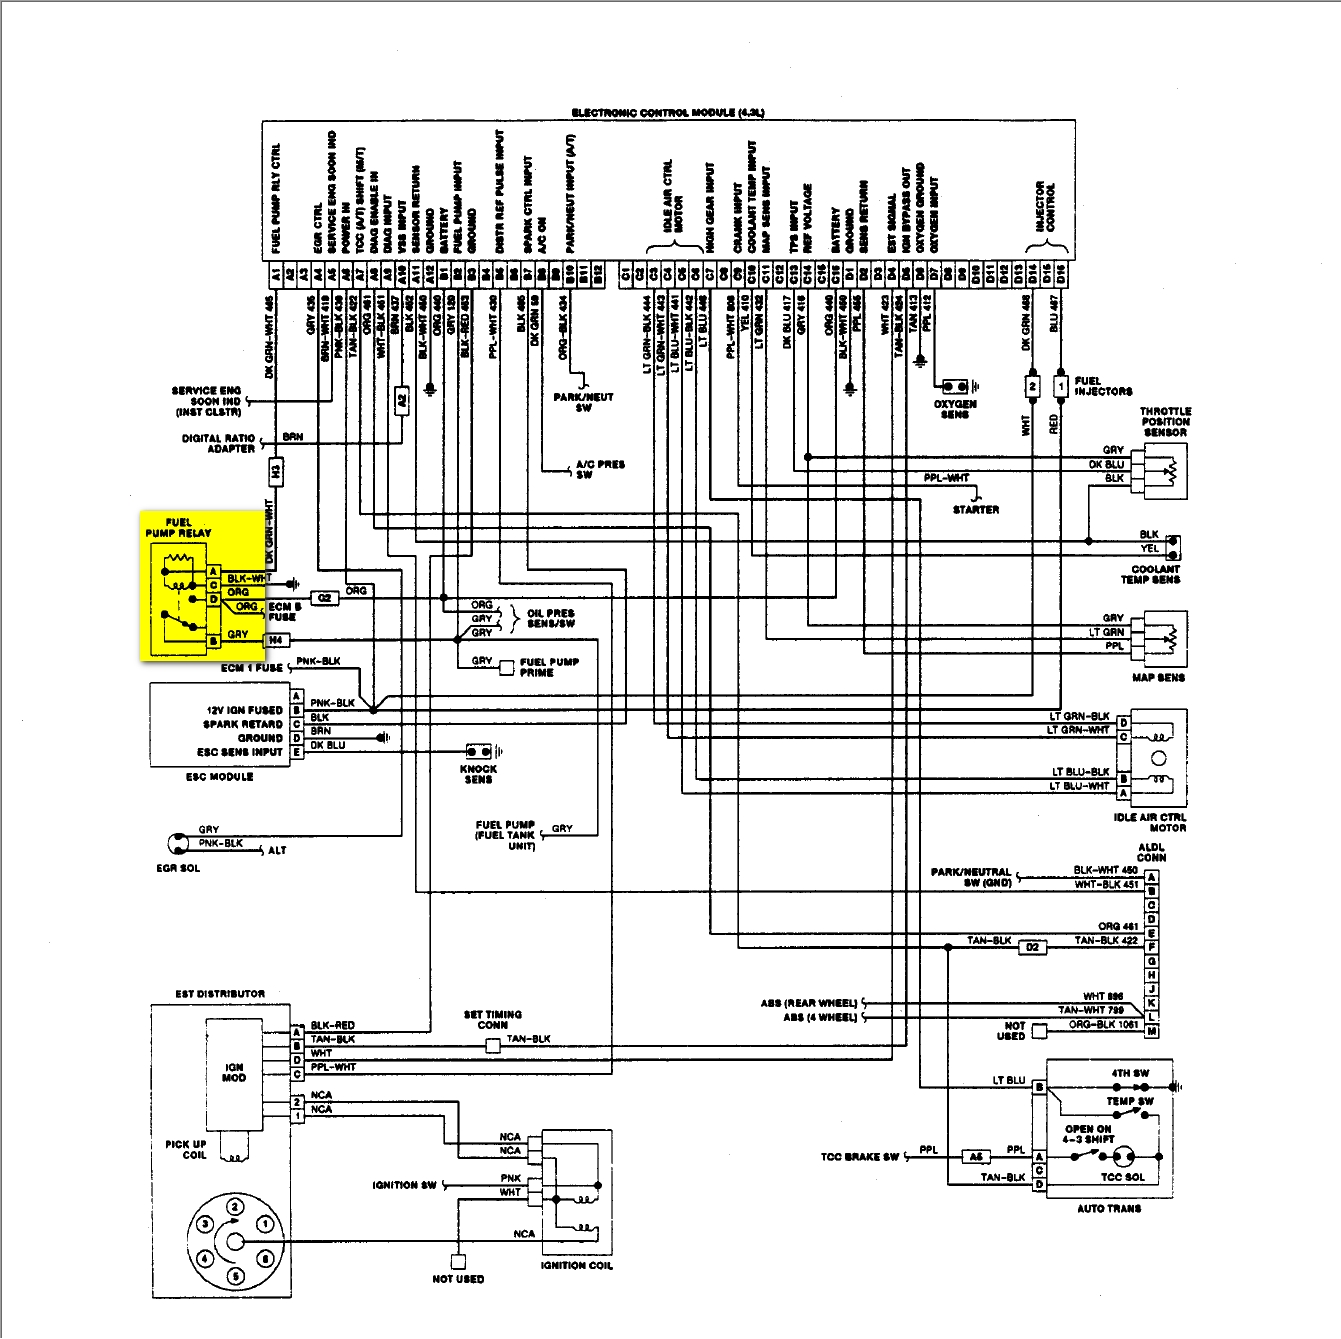 97 chevy astro van wiring diagram